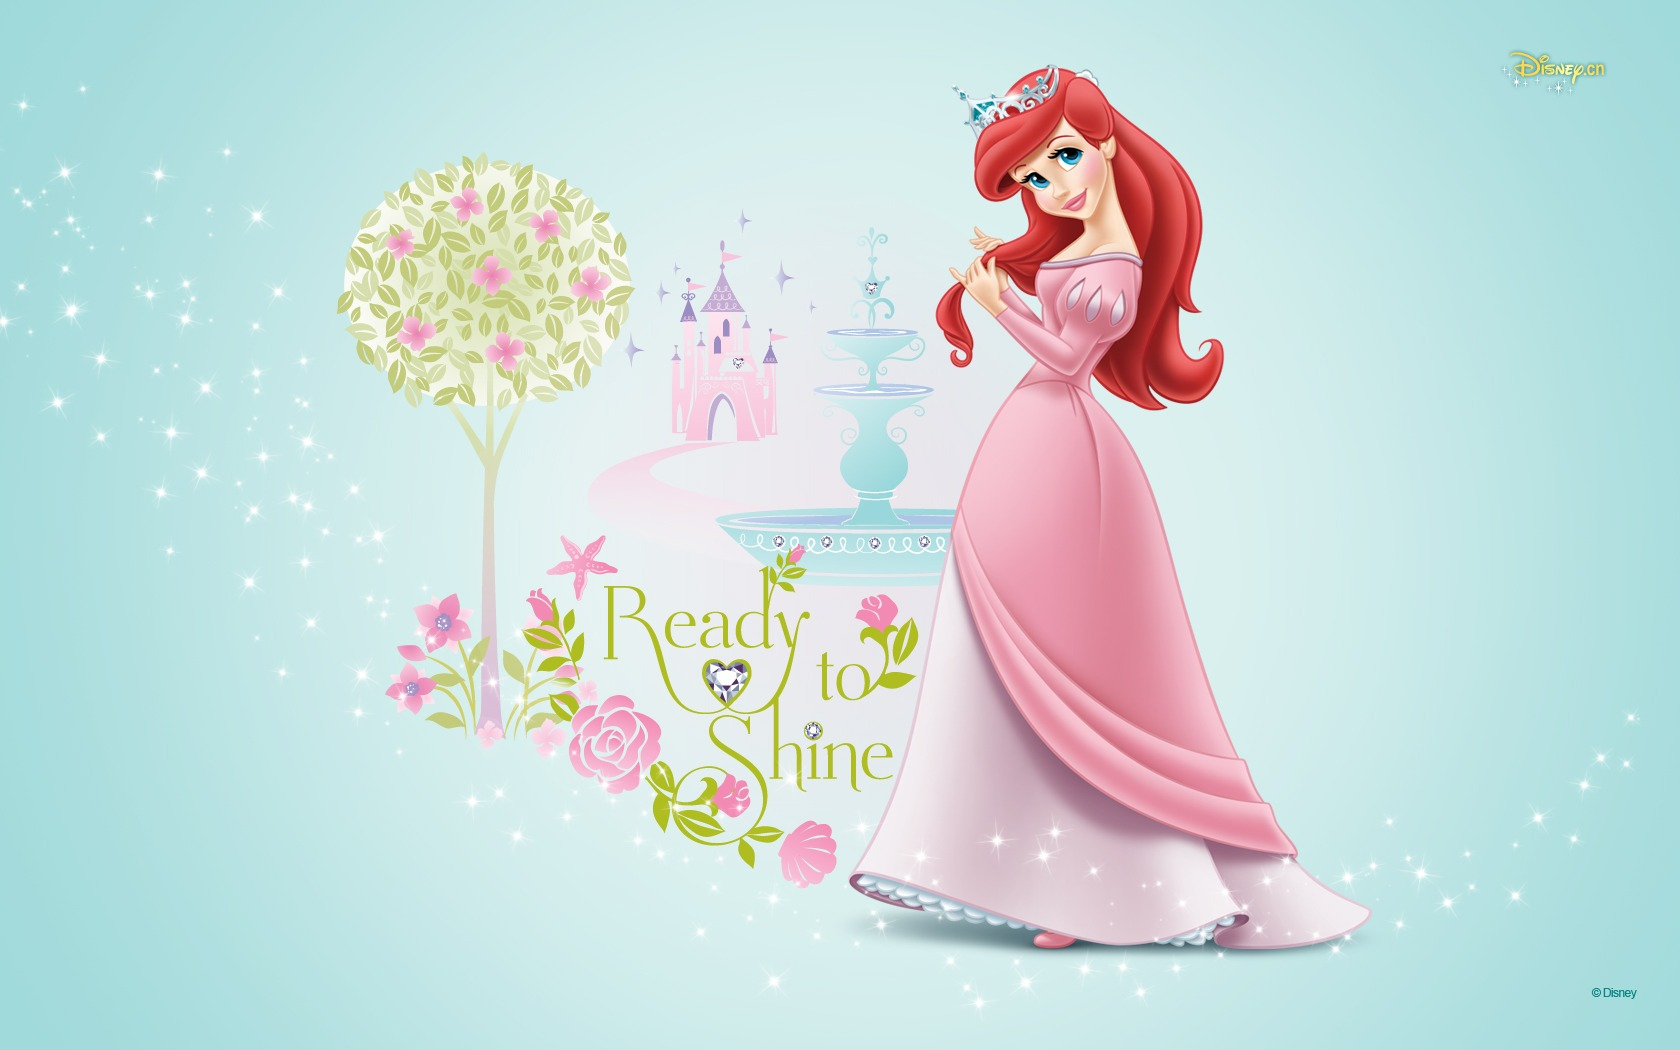 Disney Princess Wallpaper Background 10144 Wallpaper Cool 1680x1050